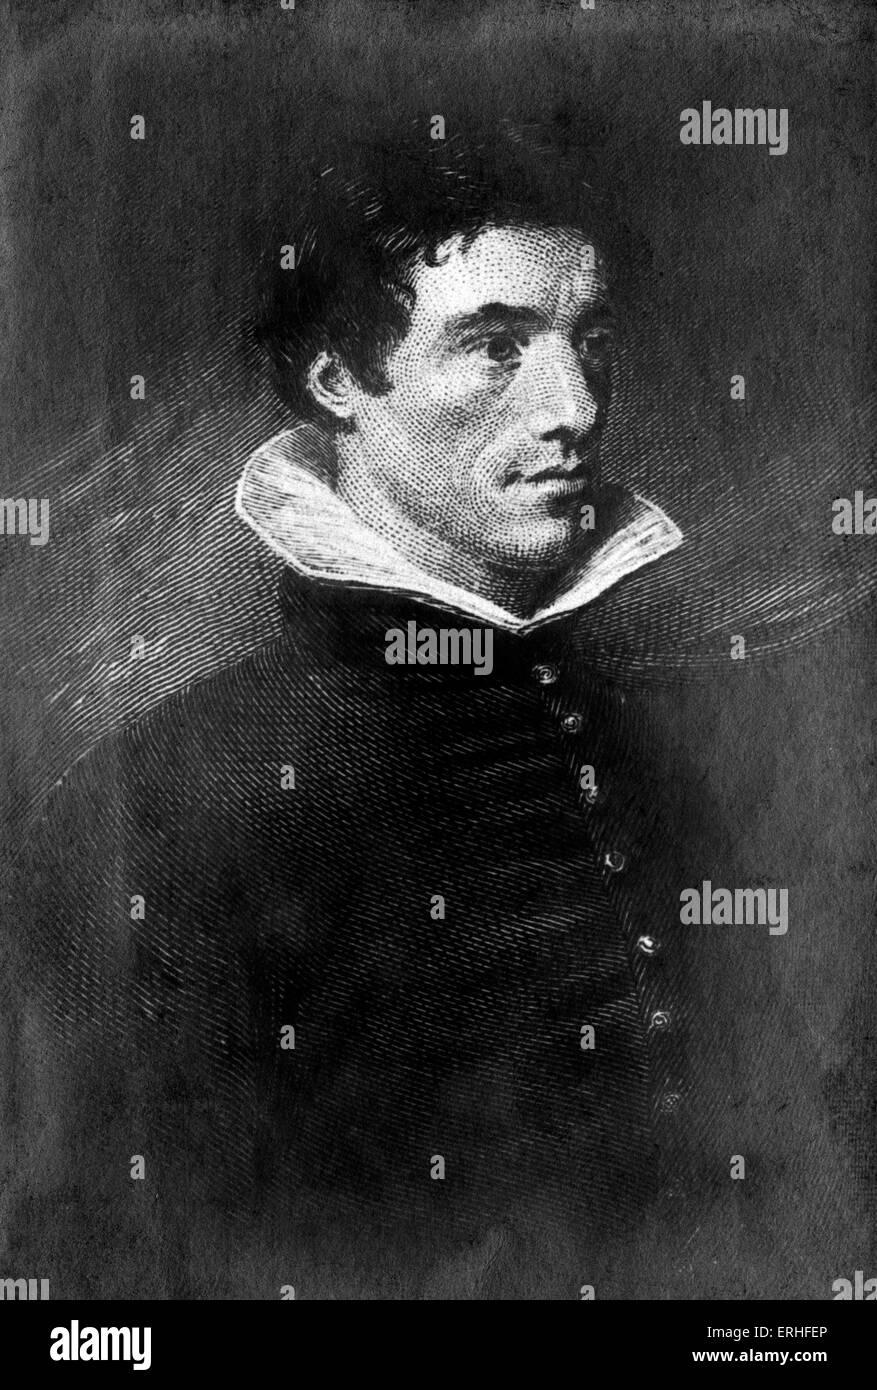 Charles Lamb - portrait - English essayist 1775 - 27 July 1834 - Stock Image